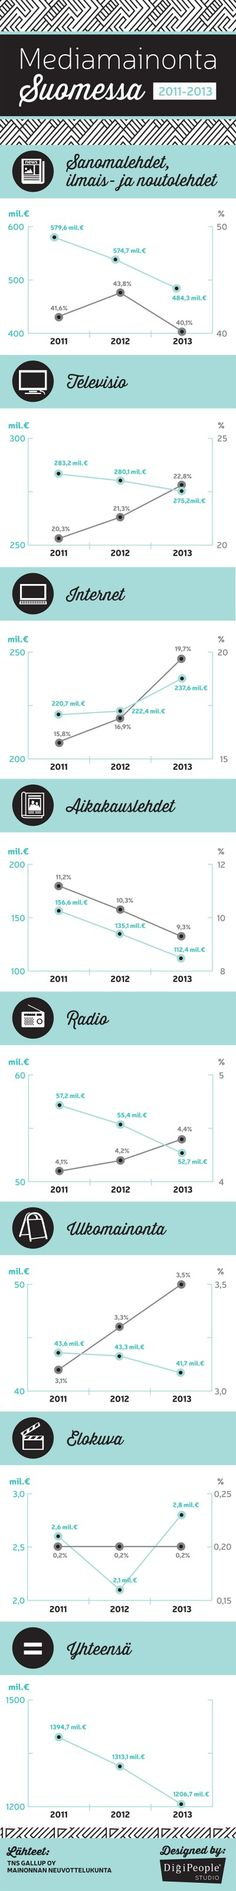 Mediamainonta-Suomessa-Infograafi-DigiPeople1